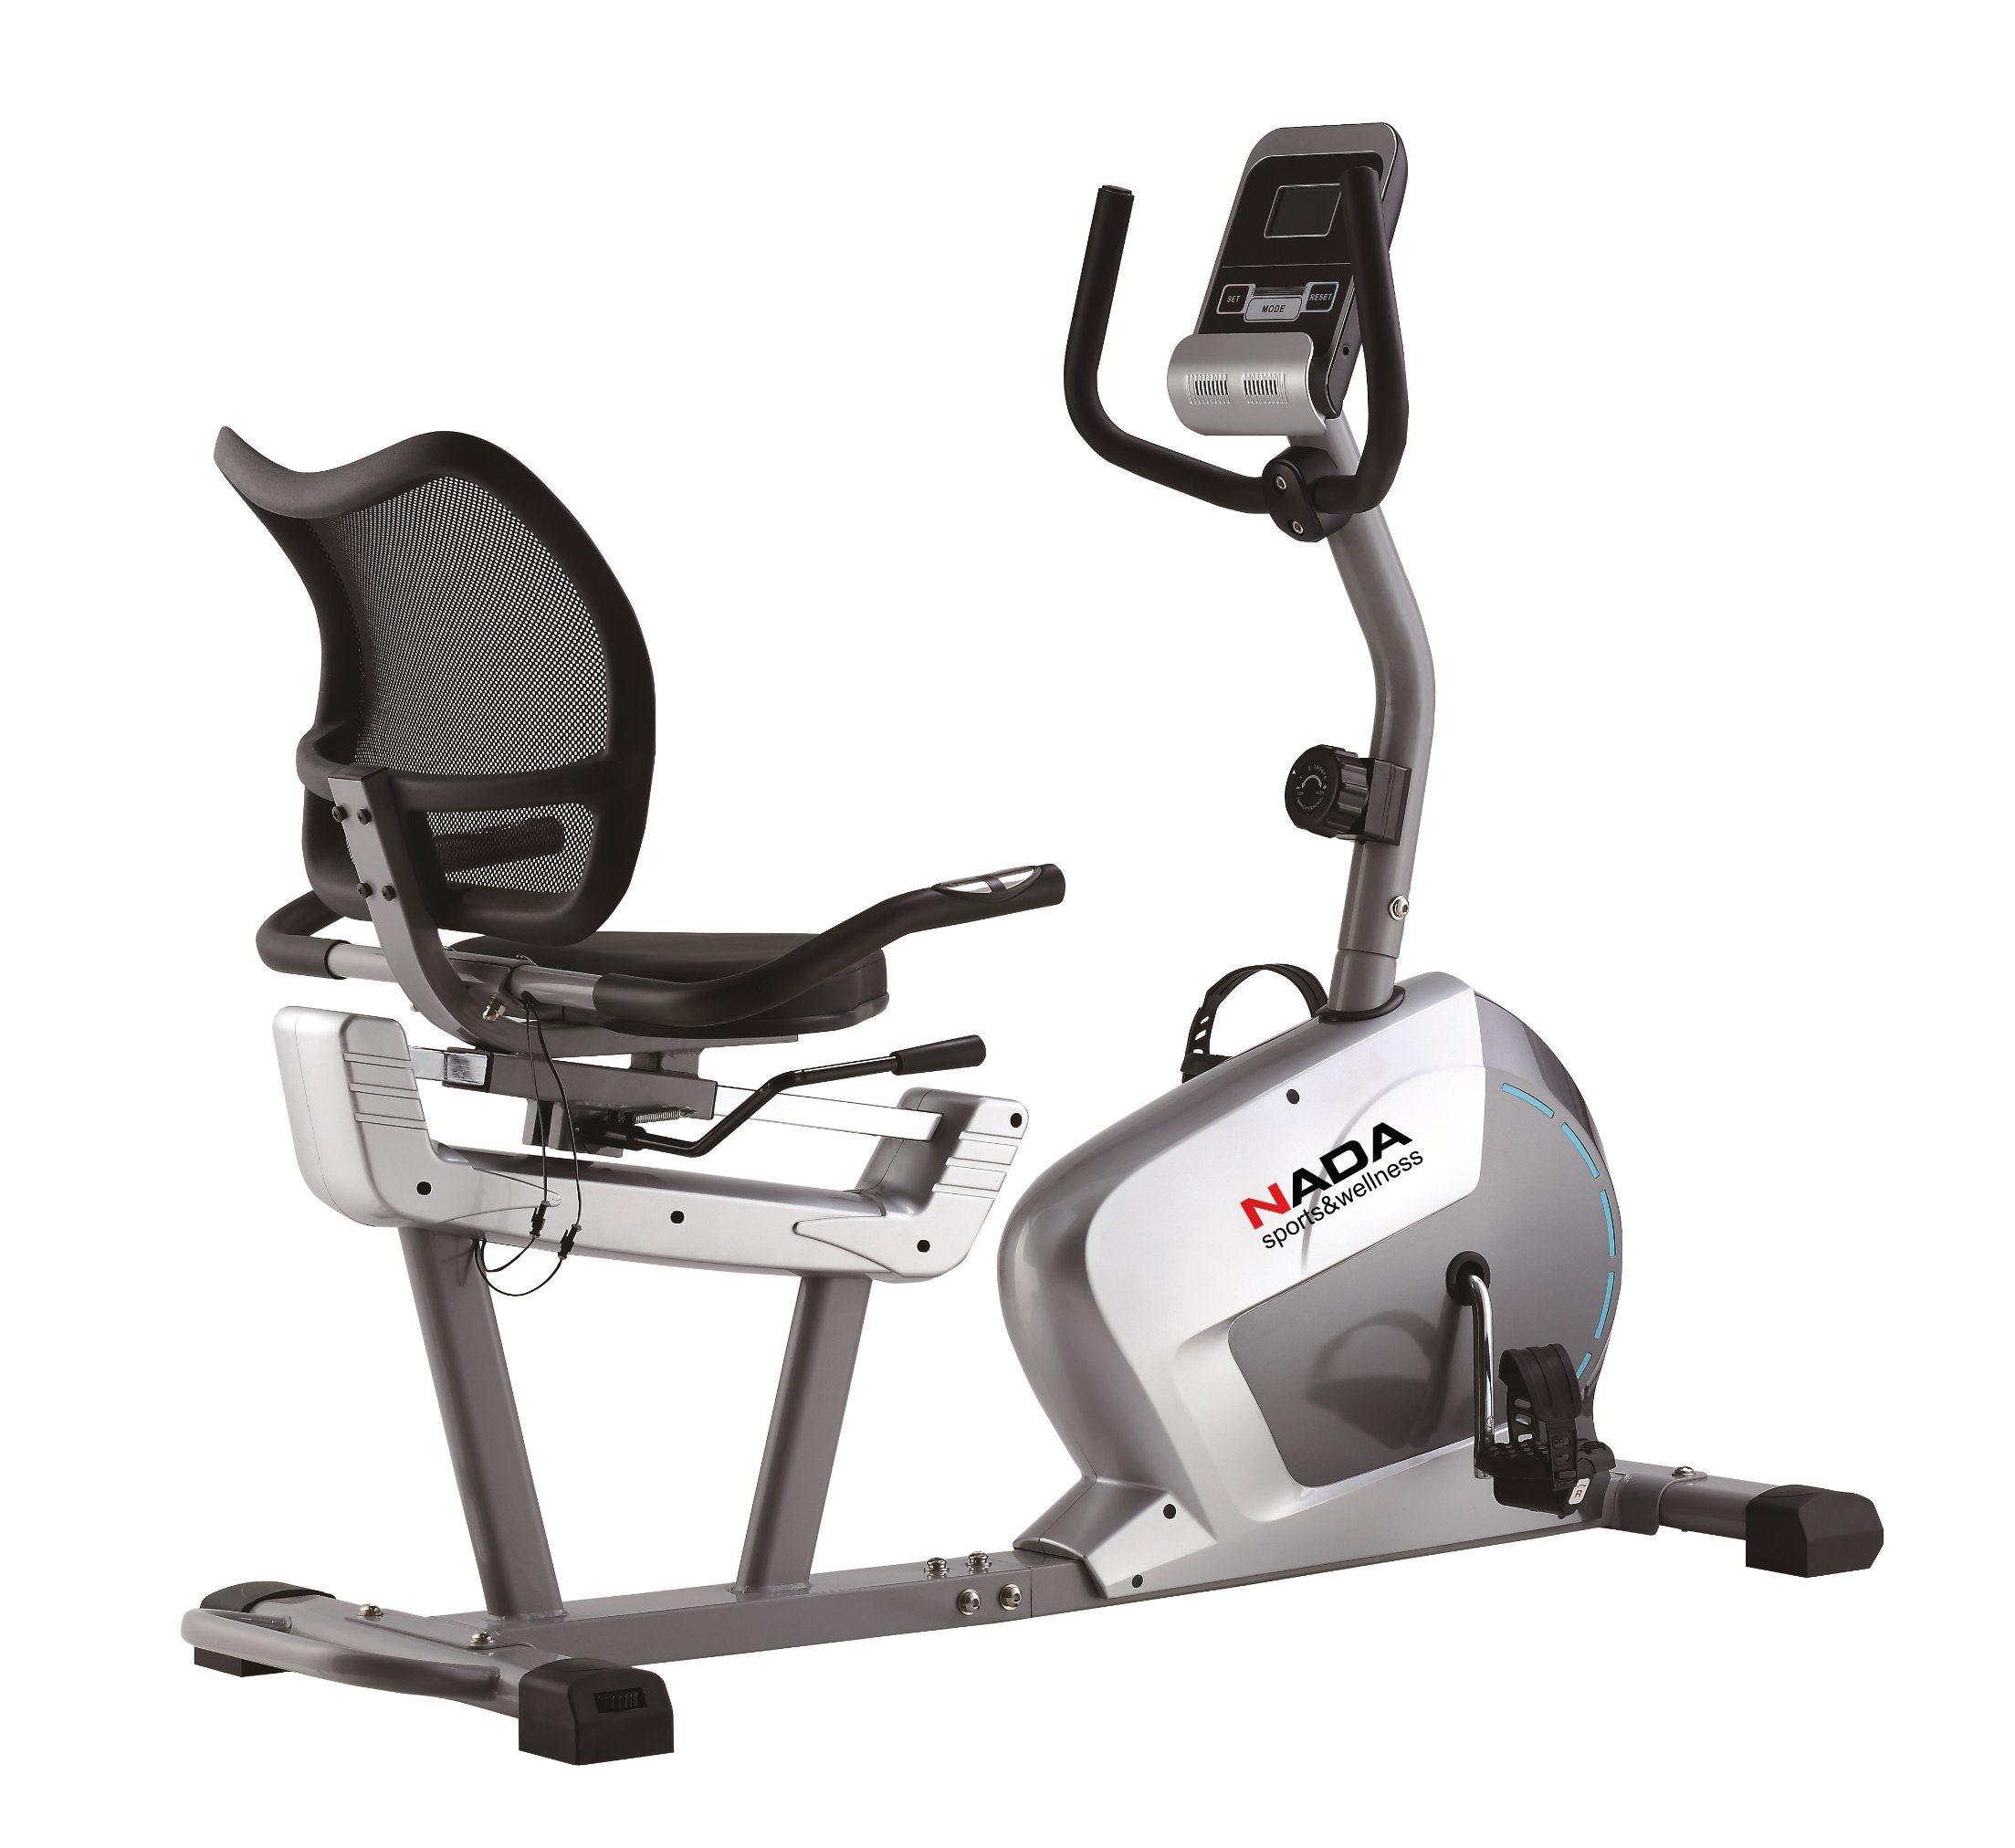 [Hot Item] Cardio Fitness Equipment Exercise Bike Magnetic Resistance Bike